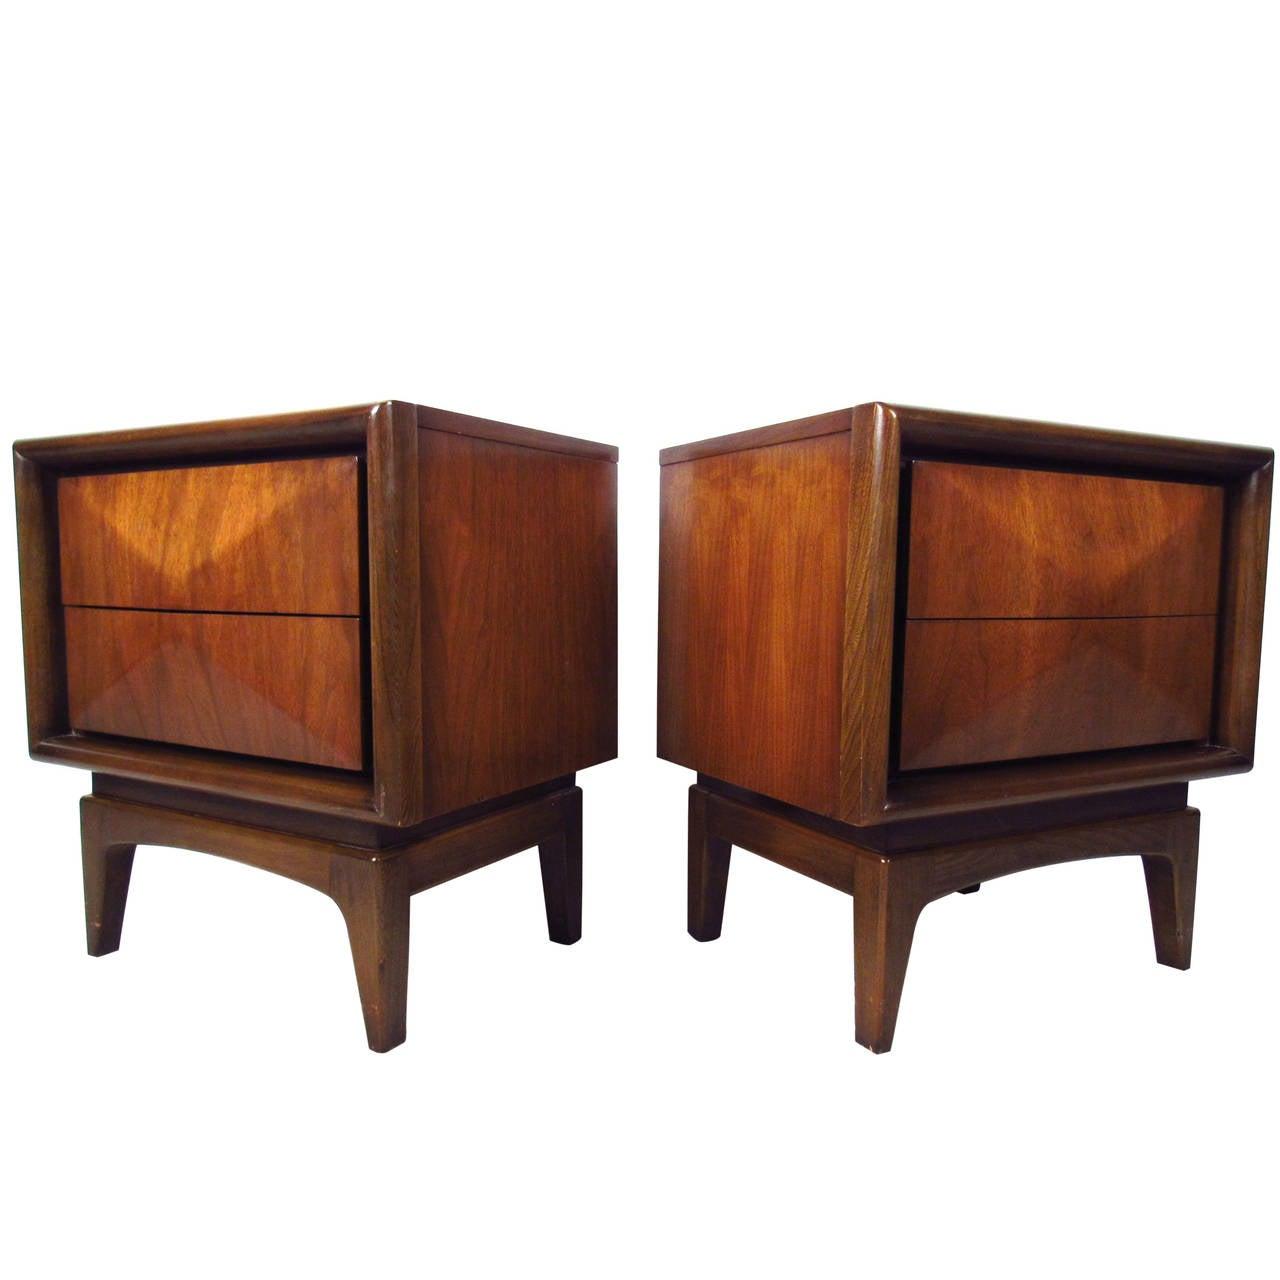 pair of midcentury modern diamond front kagan style nightstands  - pair of midcentury modern diamond front kagan style nightstands